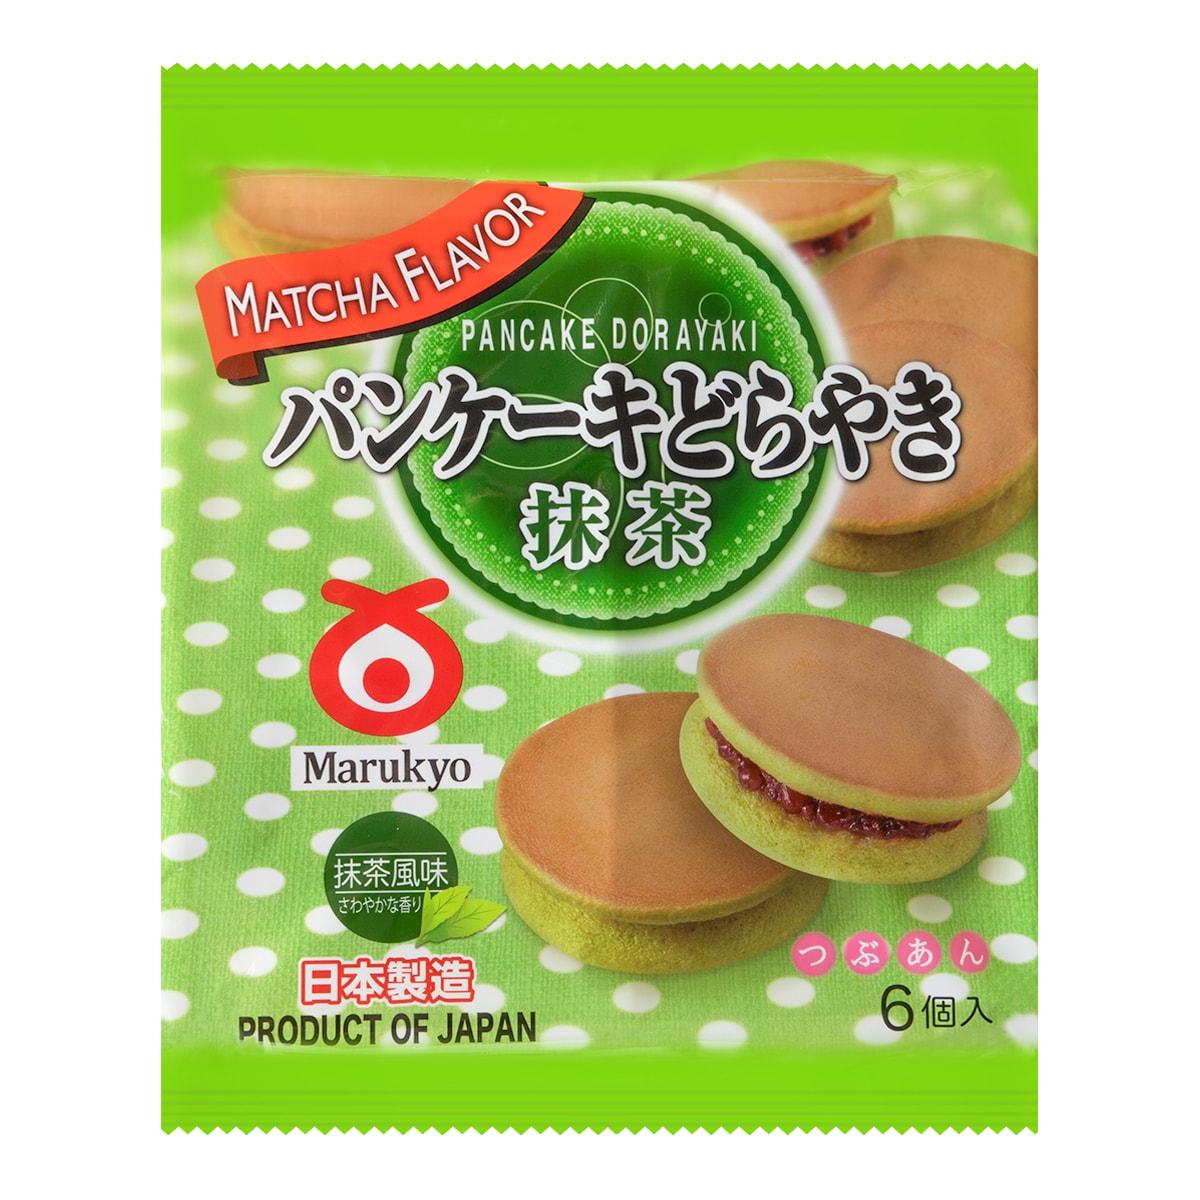 MARUKYO Baked Red Bean Cake Green Tea 6Packs 310g